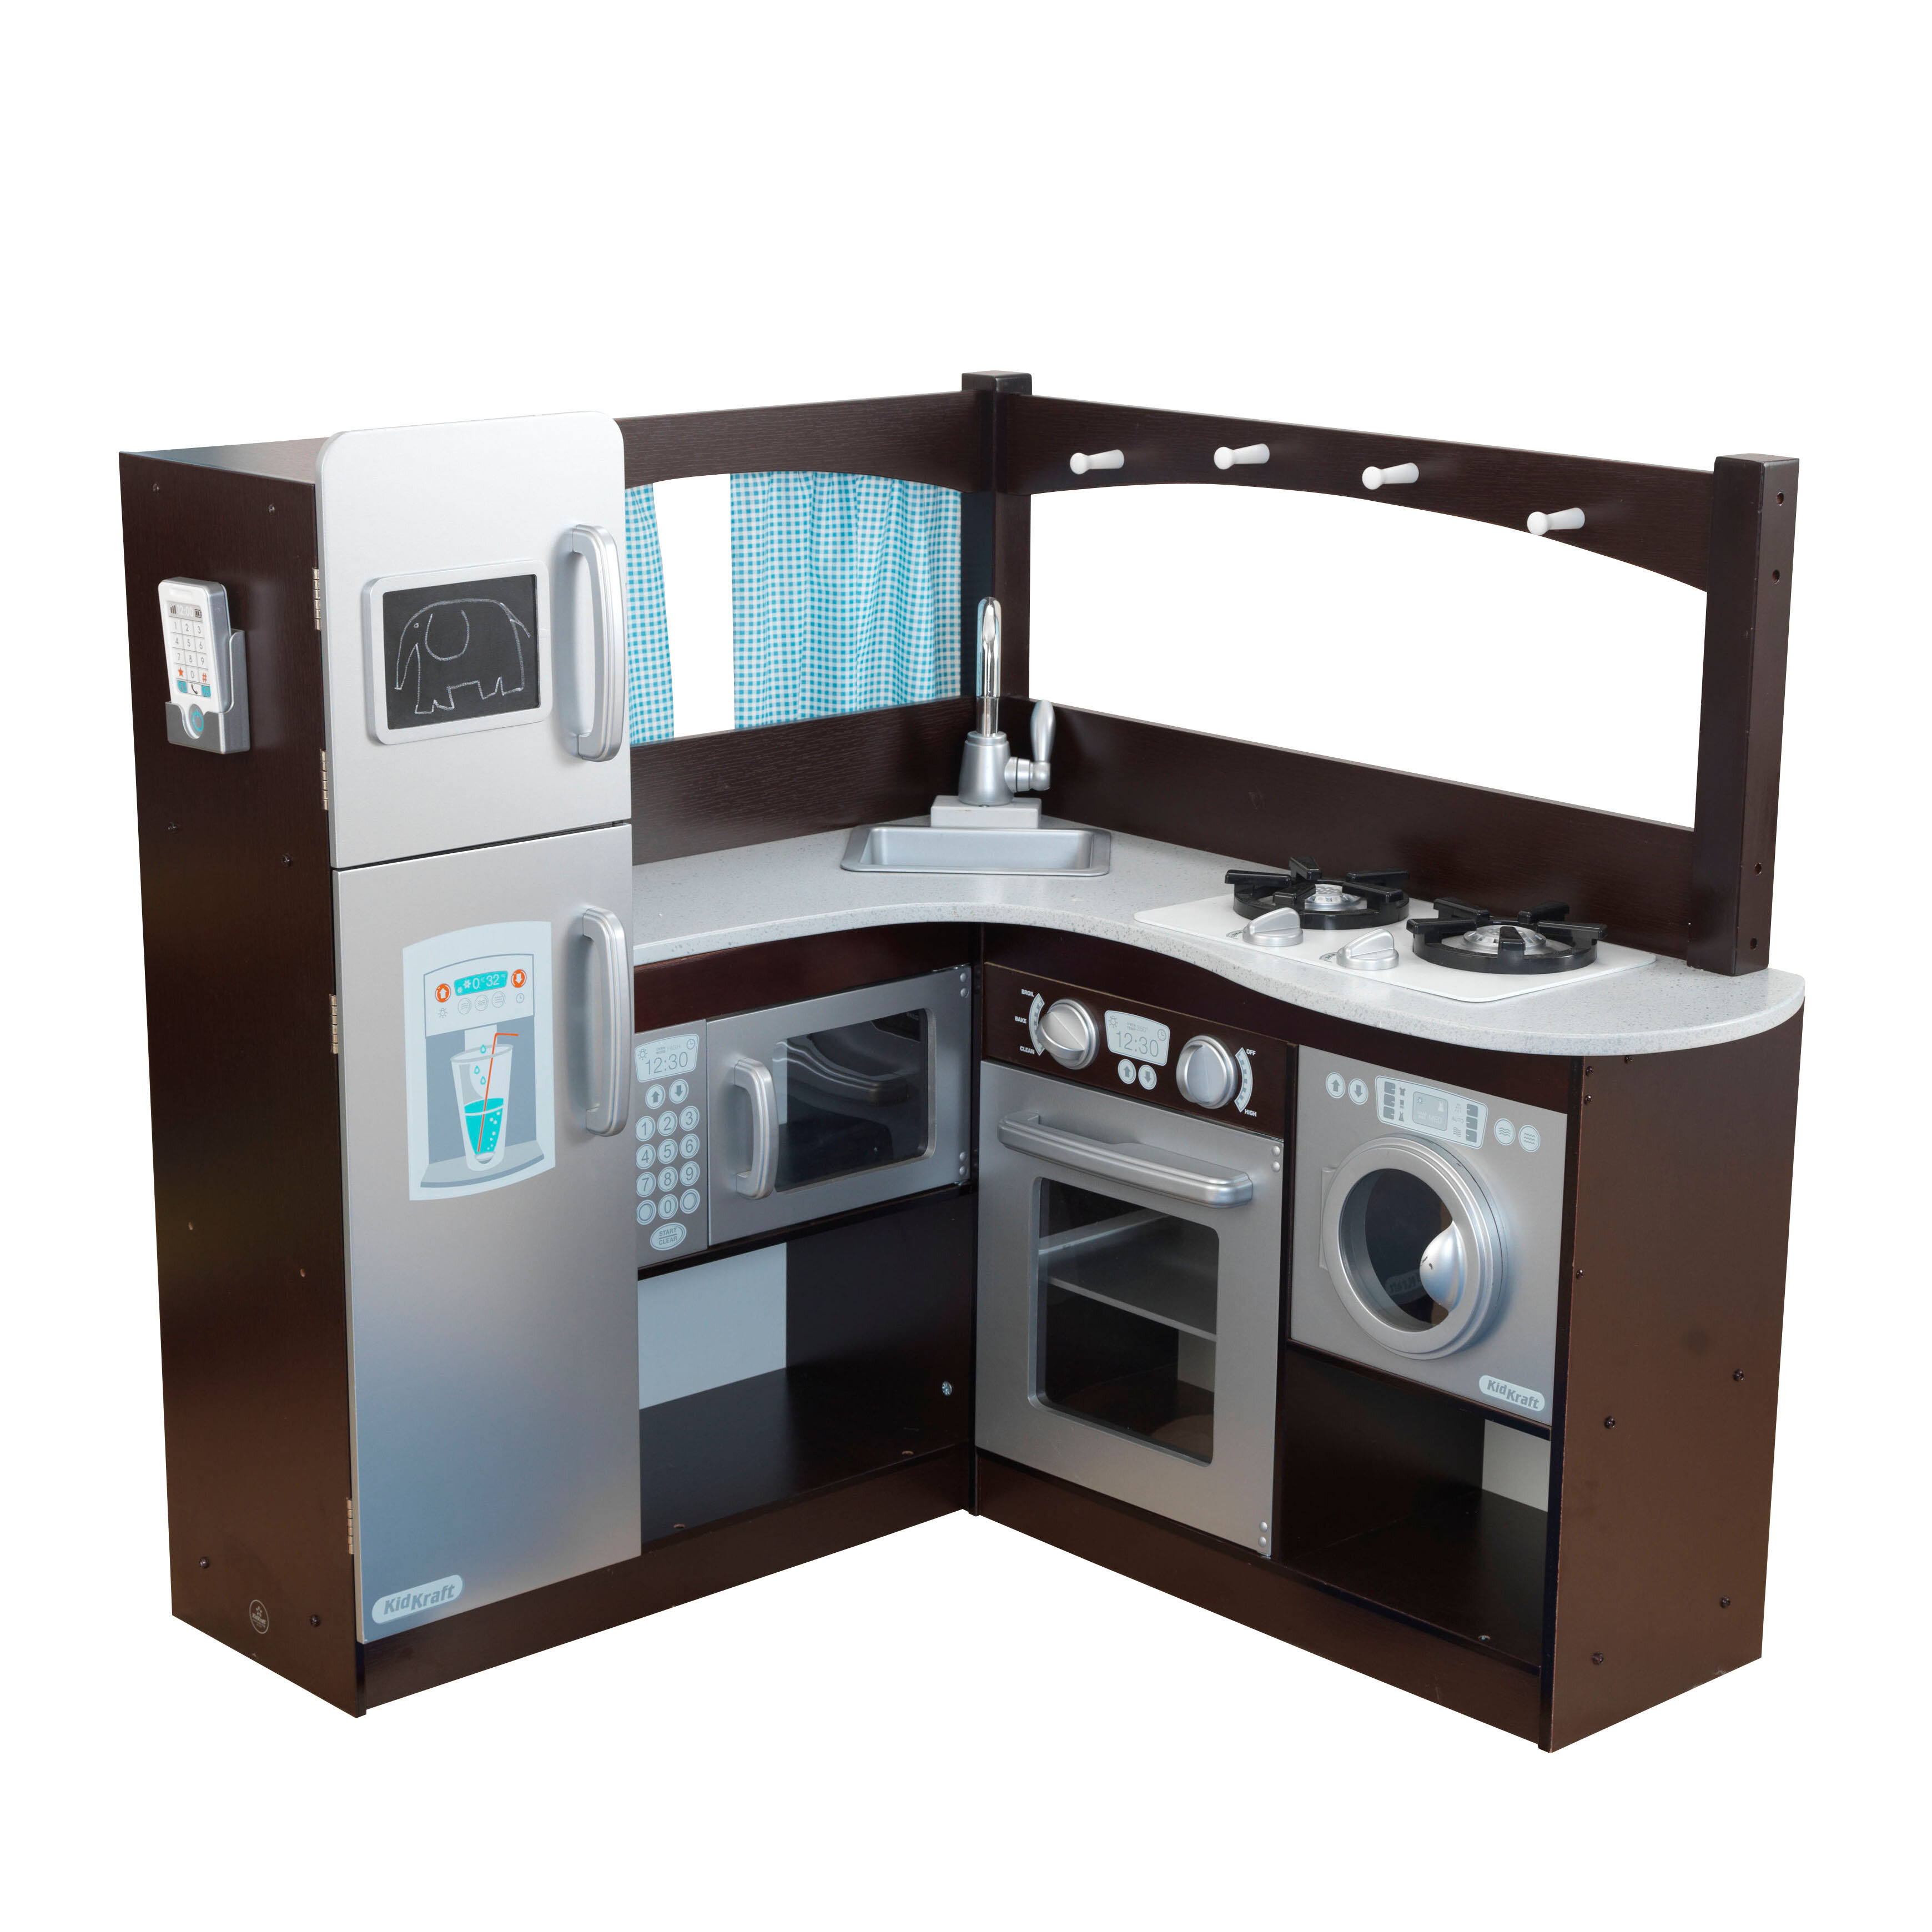 KidKraft Grand Gourmet Kitchen Set U0026 Reviews | Wayfair